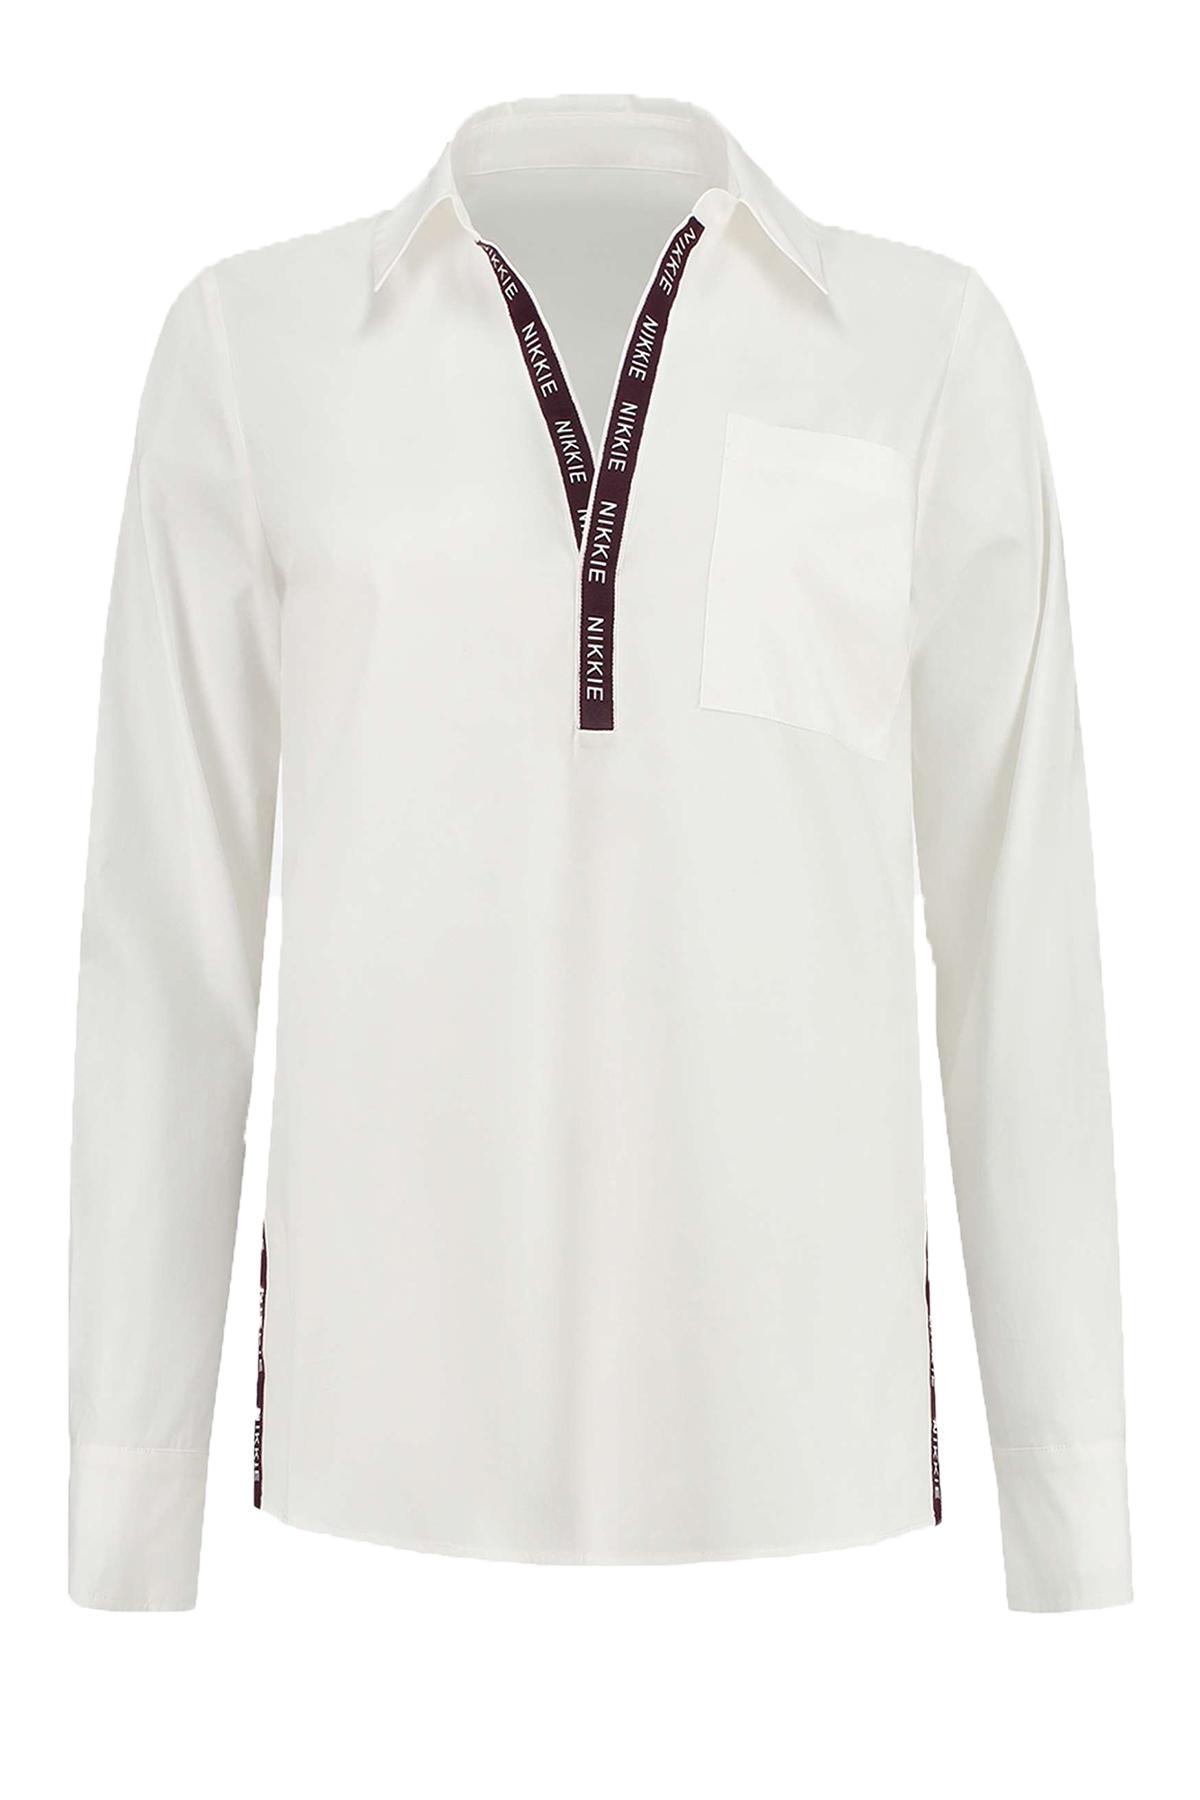 NIKKIE Shirt / Top Wit N 6-049 2002